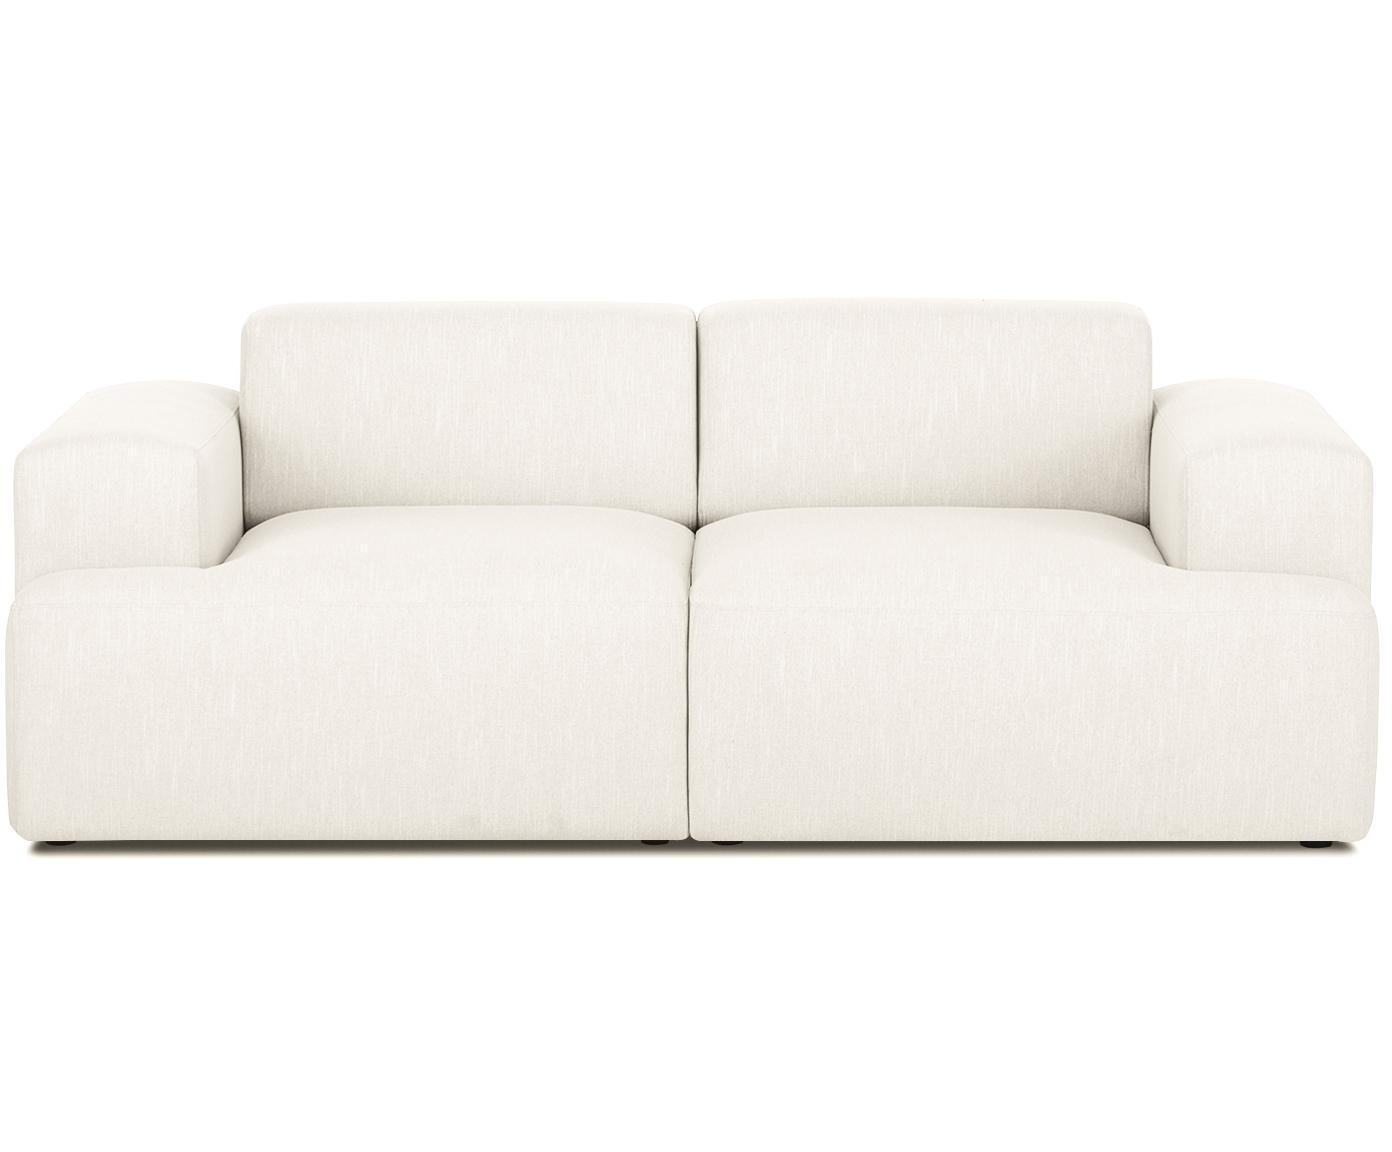 Sofa Melva (2-Sitzer), Bezug: Polyester 35.000 Scheuert, Gestell: Massives Kiefernholz, Spa, Webstoff Beige, B 200 x T 101 cm